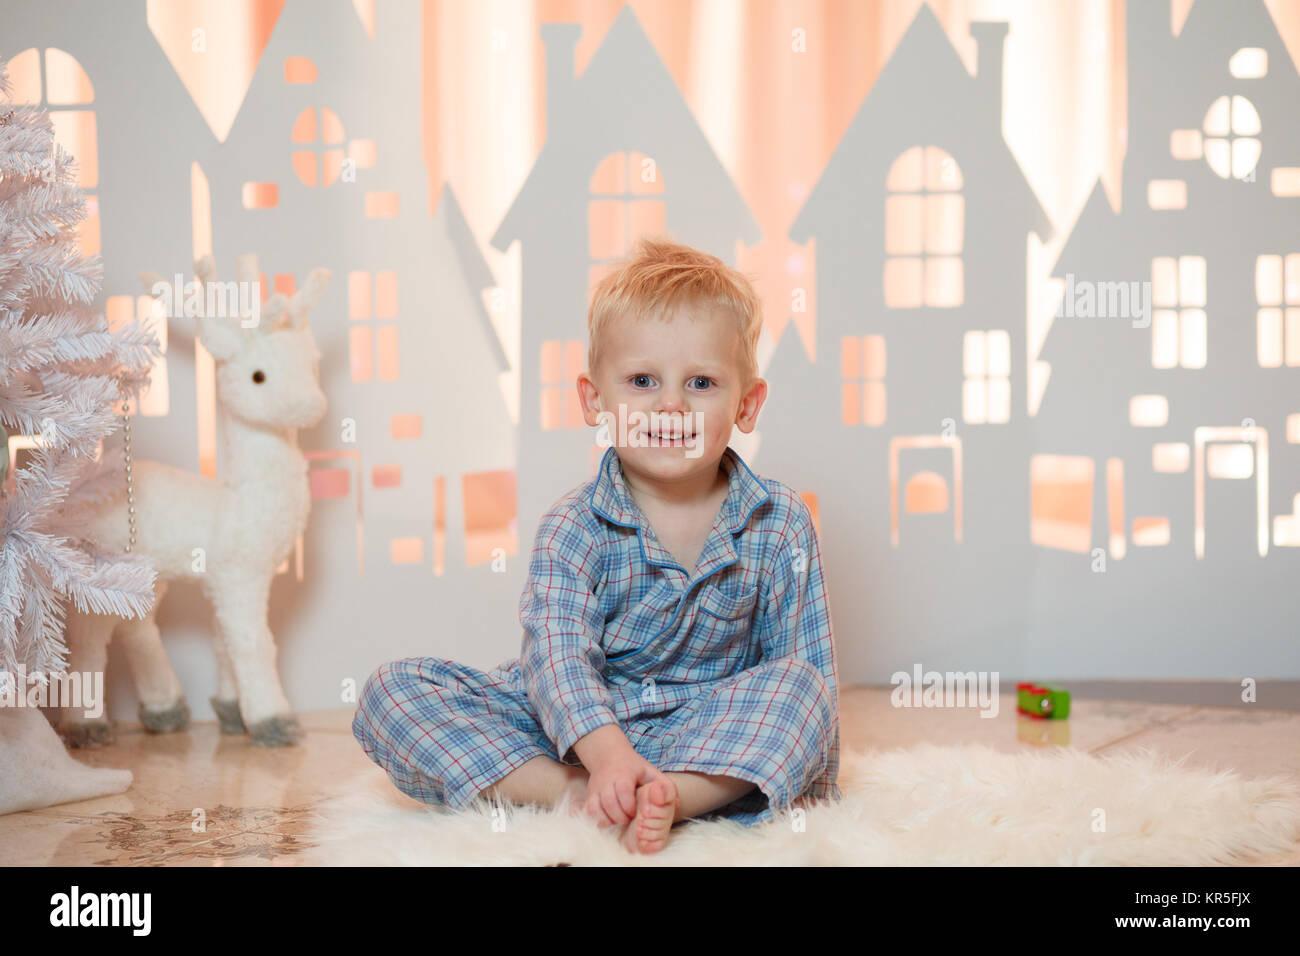 Cute blonde hair little boy in sleepwear near christmas toy paper houses. - Stock Image